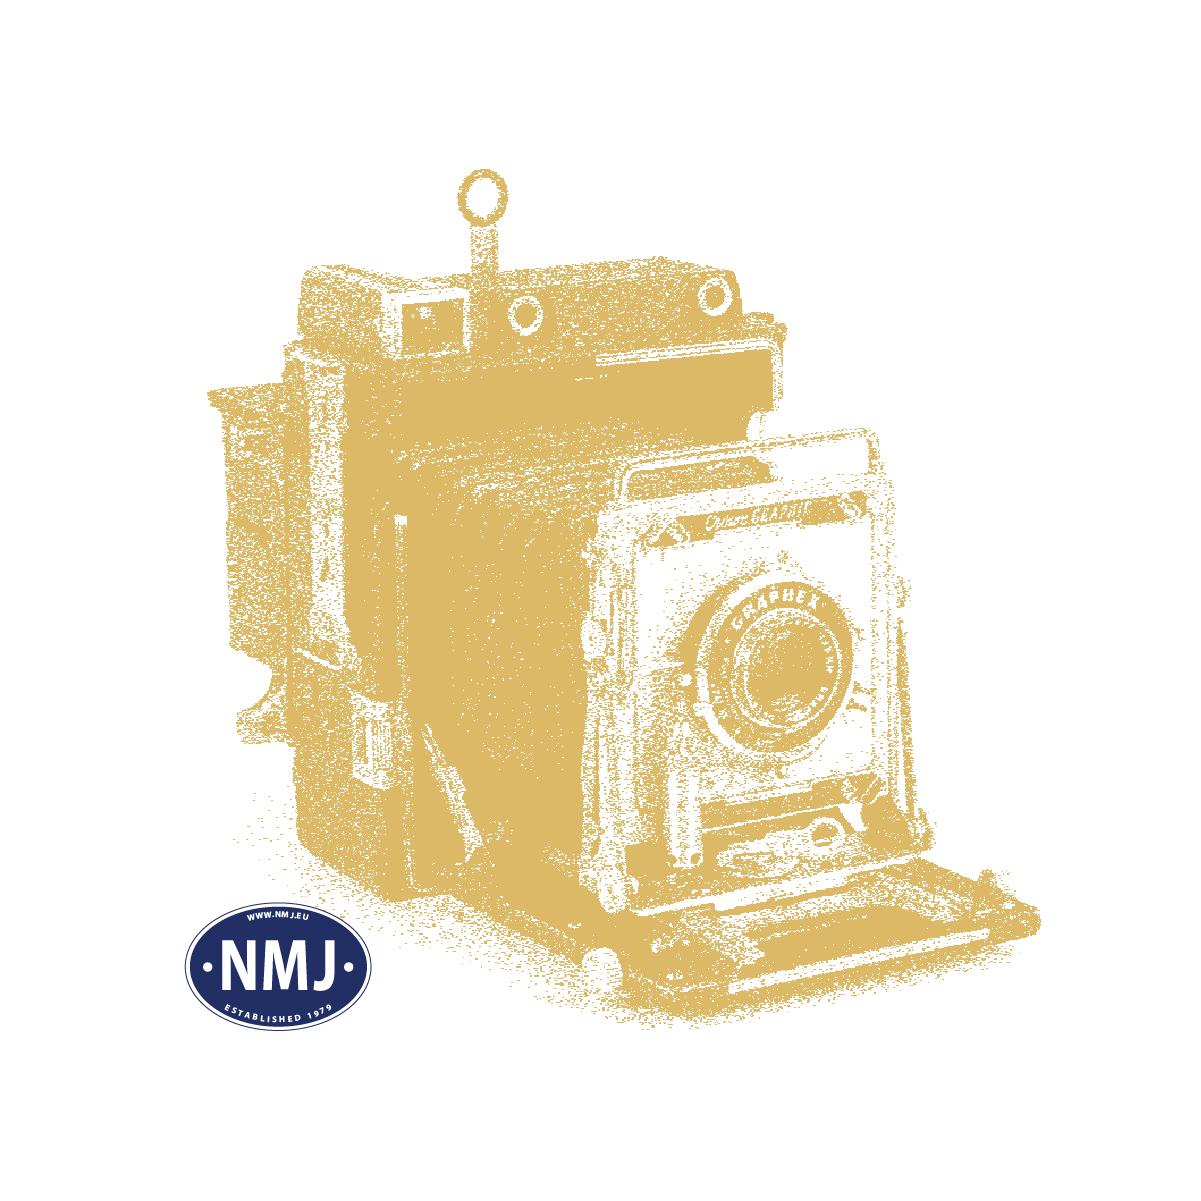 NMJT95402 - NMJ Topline SNCB 202003, AC m/ Lyd